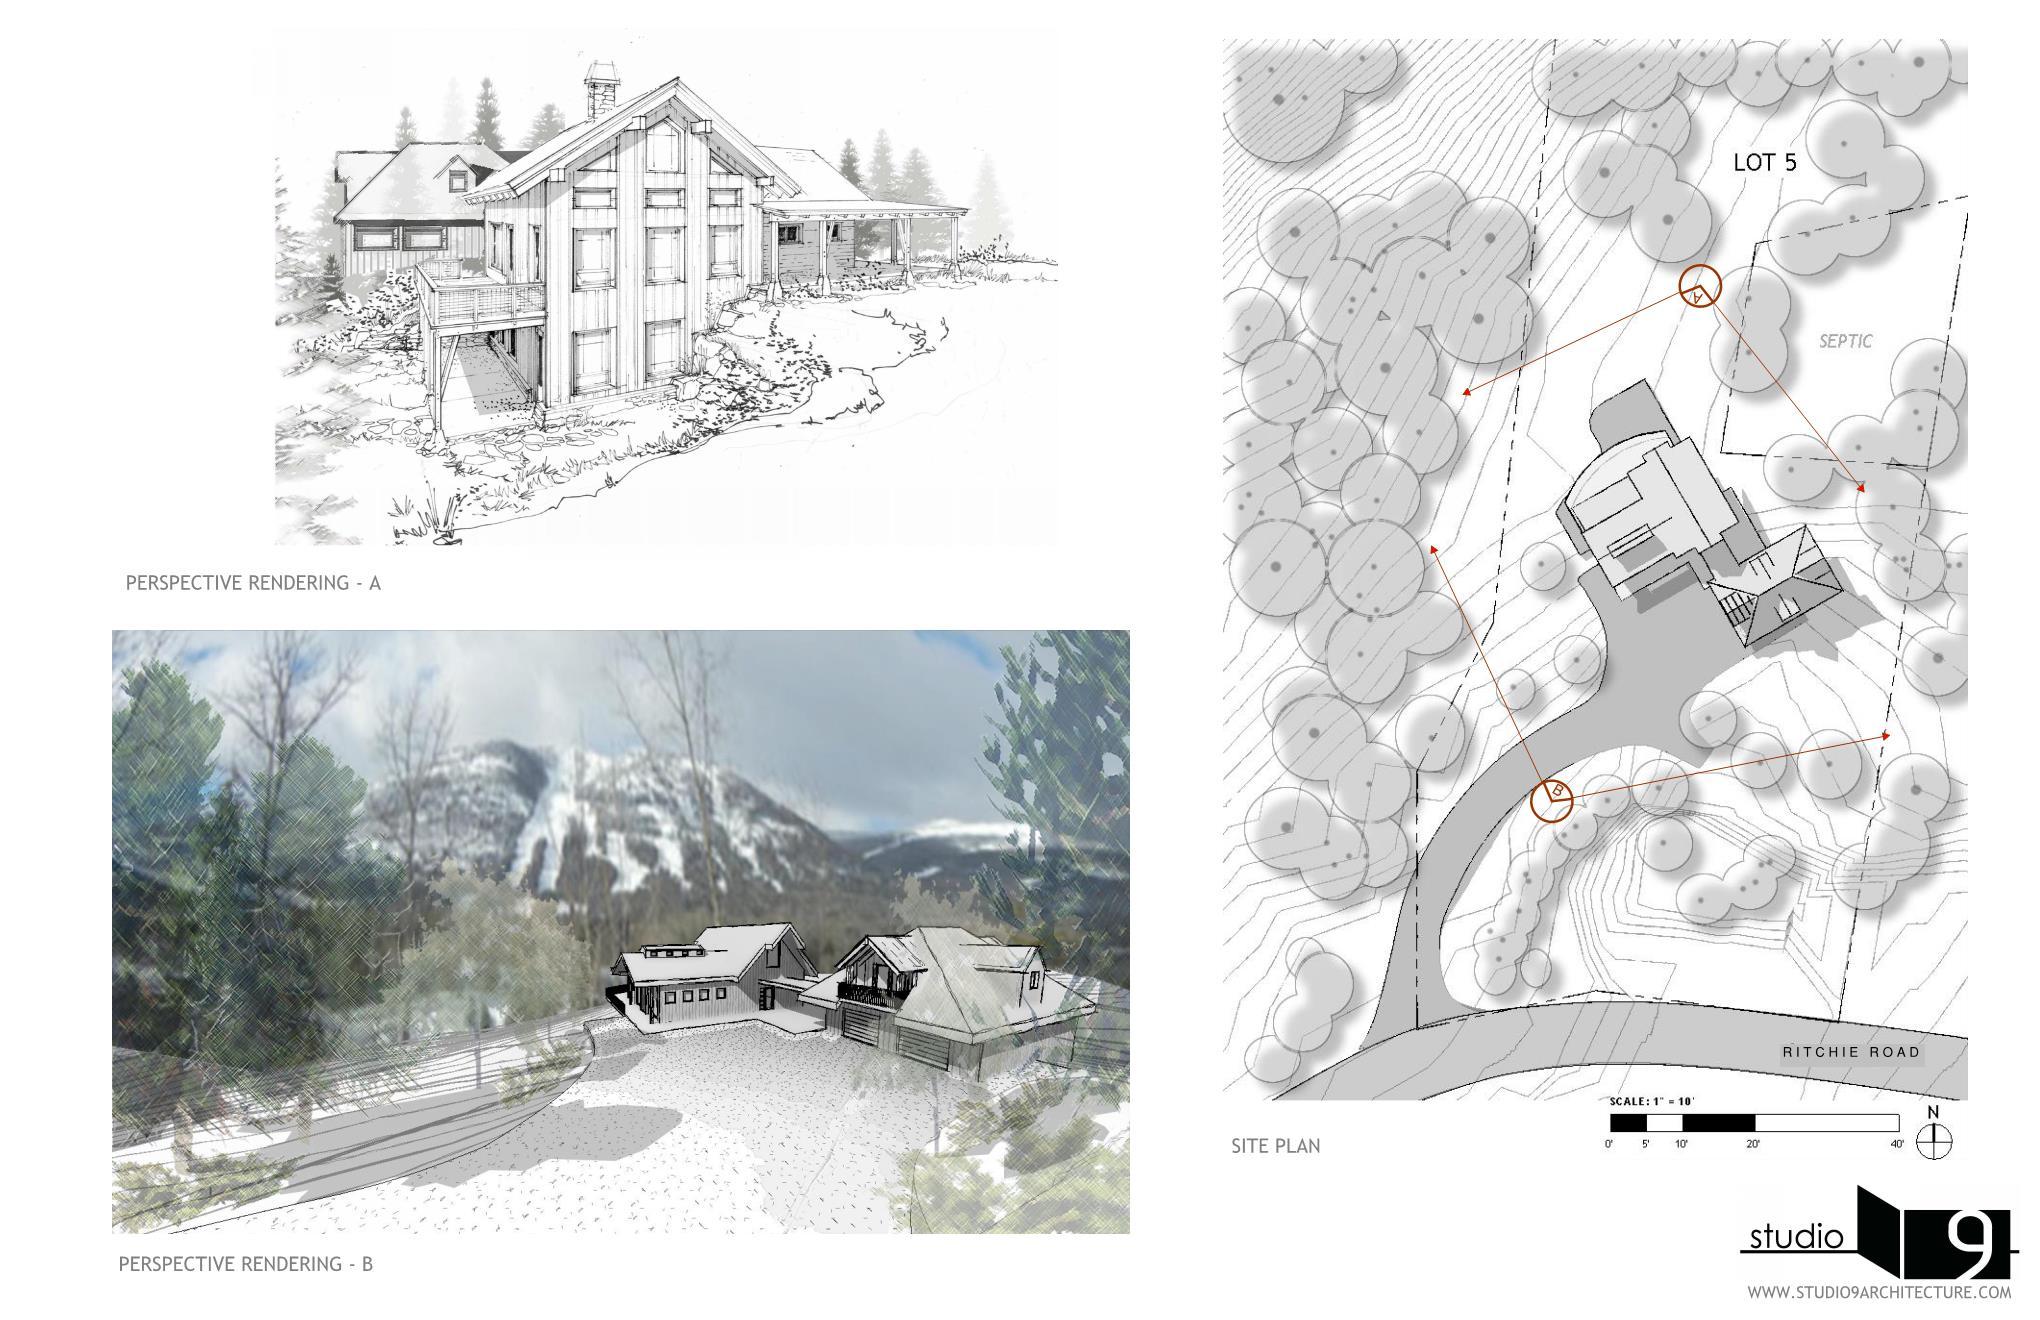 Steven kaup studio 9 architecture planning - Studio ix architecture ...